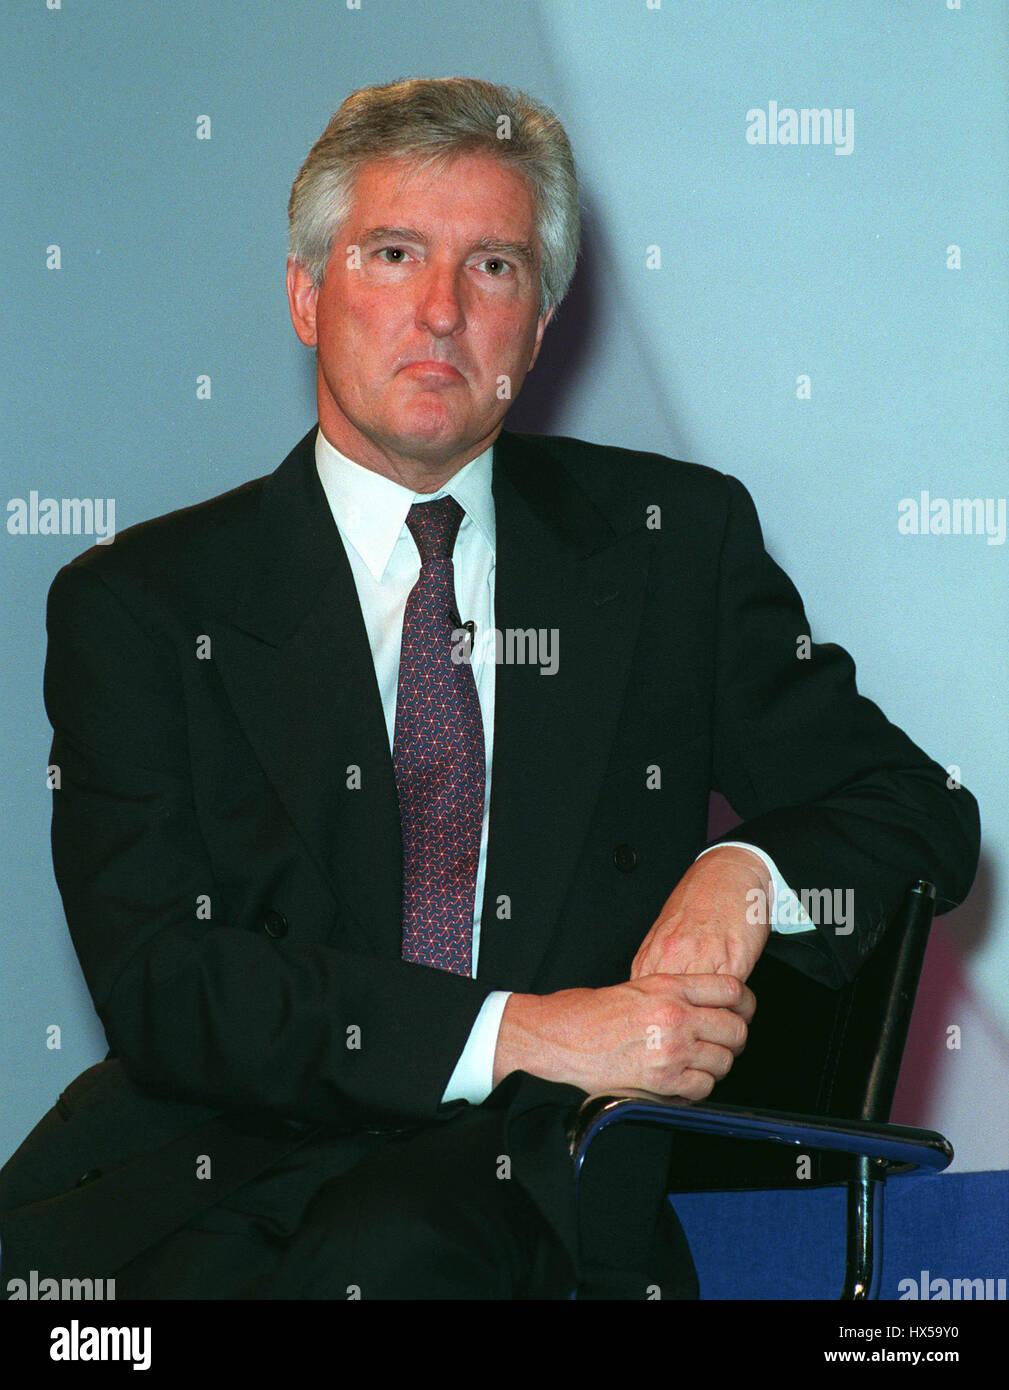 JOHN MAPLES MP SHADOW HEALTH SEC. 16 October 1997 - Stock Image